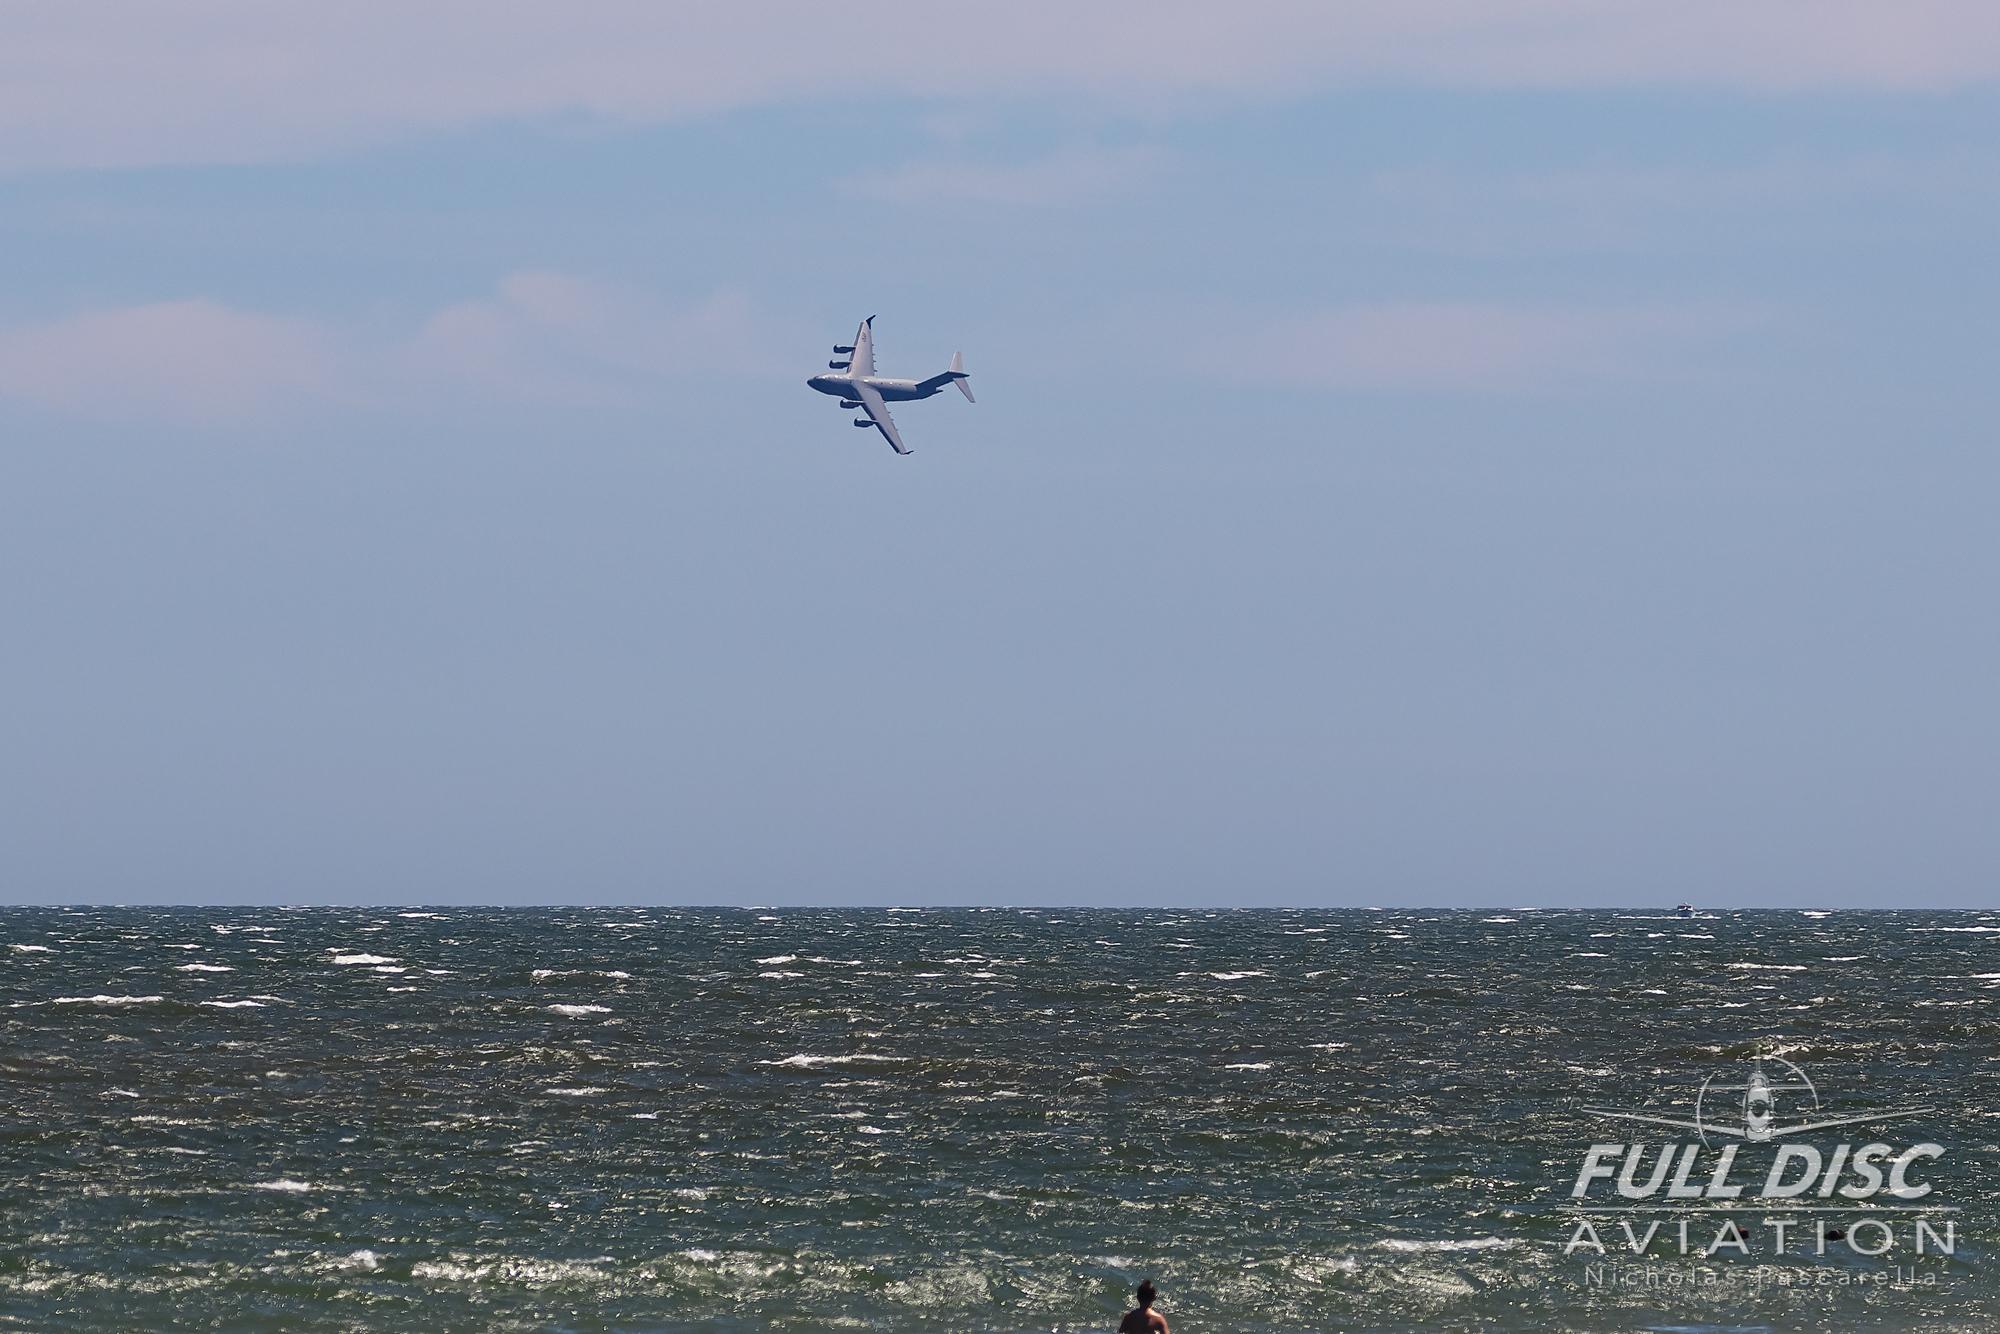 nickpascarella_fulldiscaviation_oceancityairshow_aviation_c17.jpg